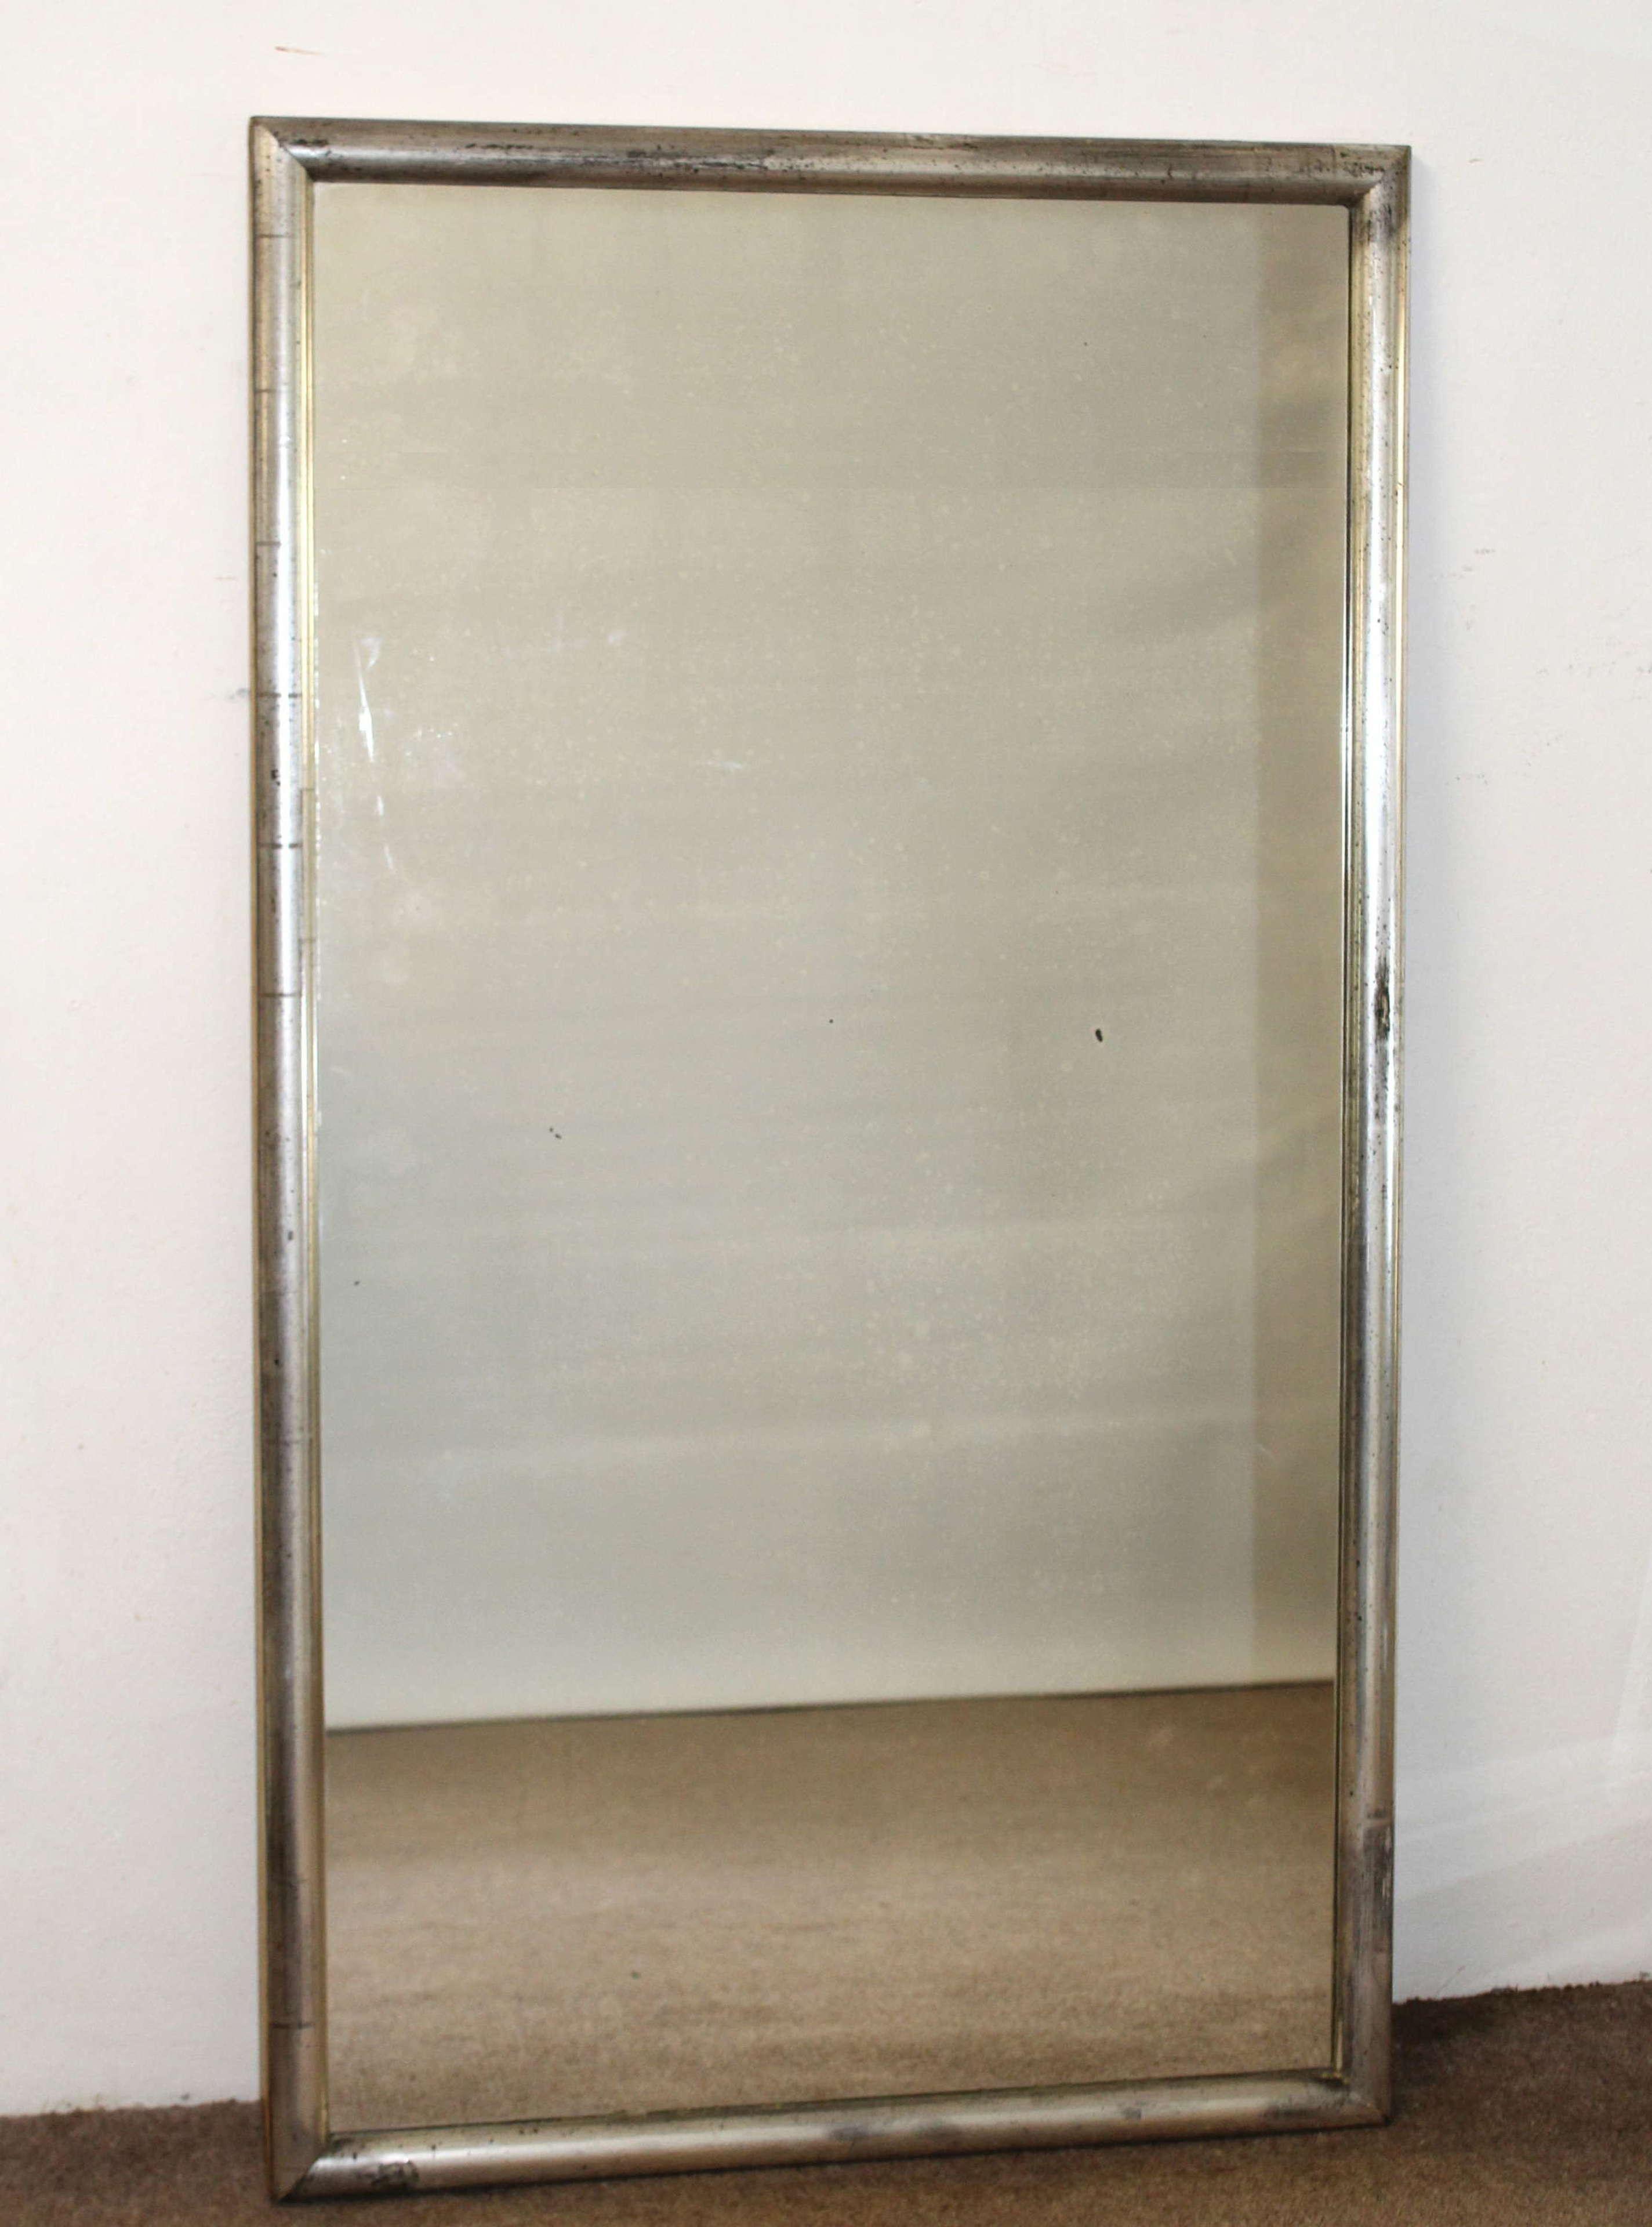 Antique French Bistro mirror with silverleafed frame